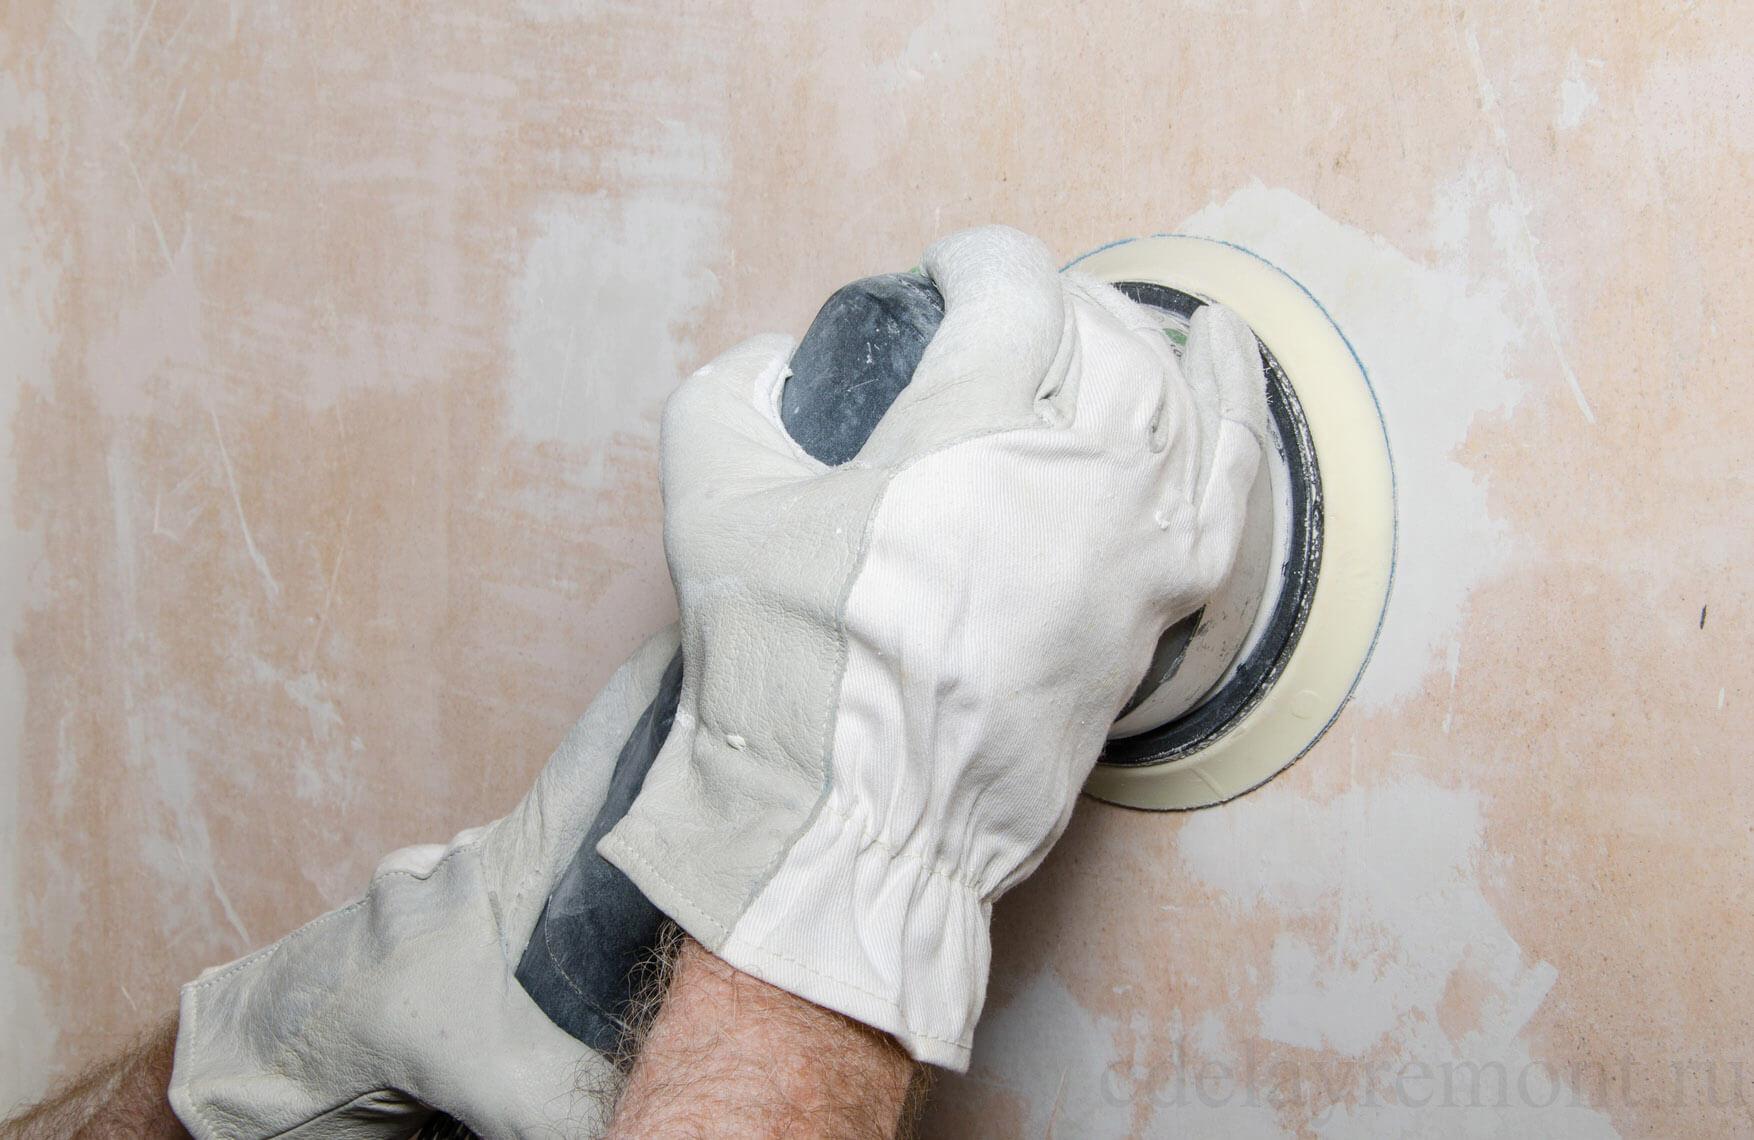 вариант применения шлифовки стен в ремонте дома